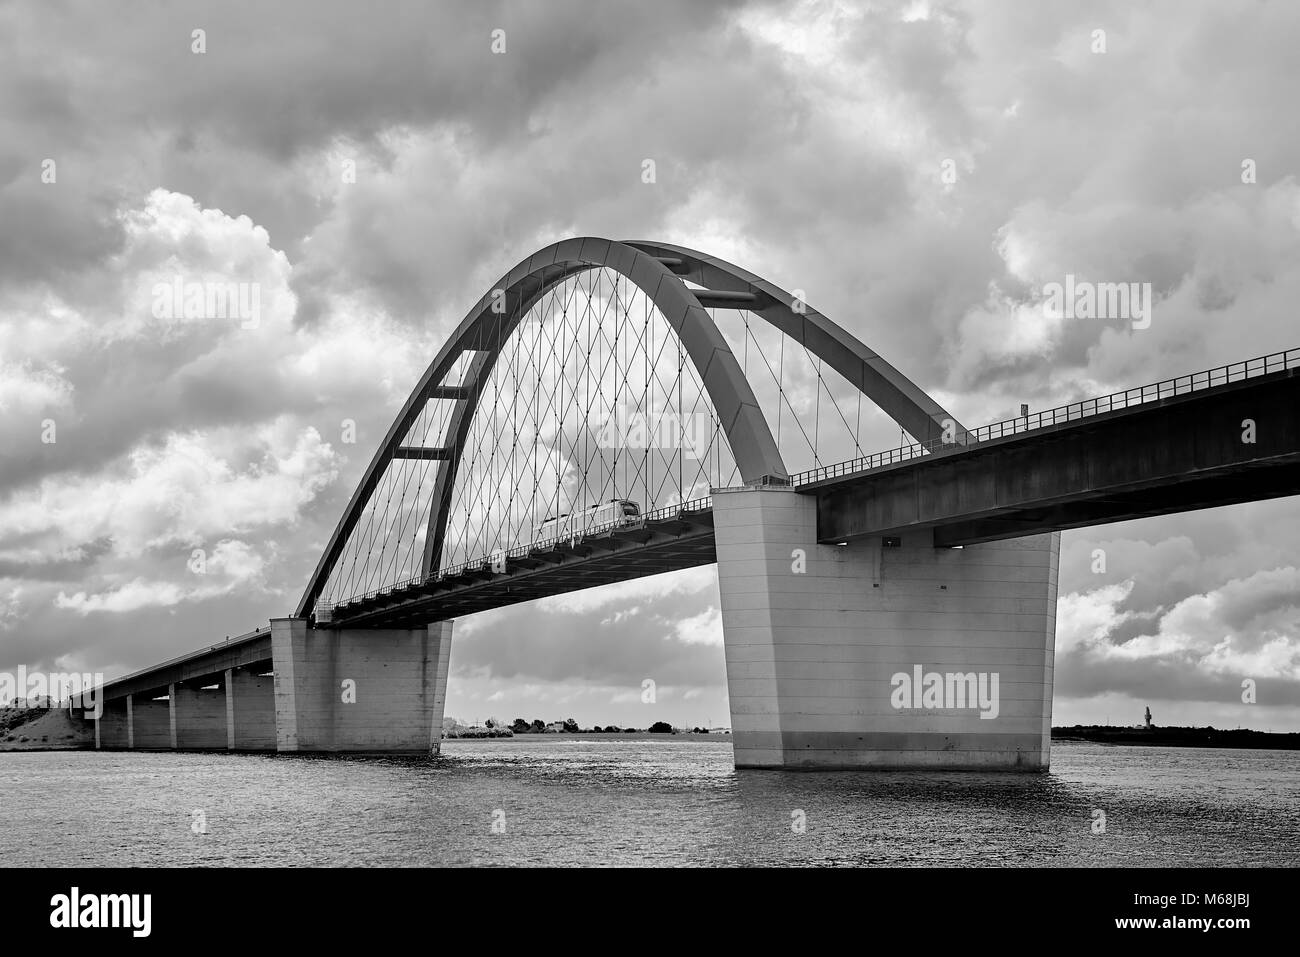 fehmarnsundbrücke in schwarz weiss - Stock Image